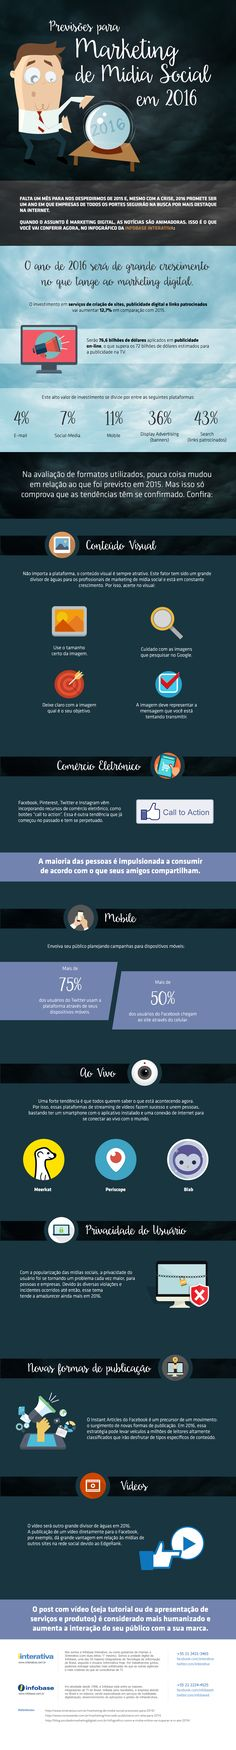 [infográfico] Marketing Social para 2016 | Mkt Sem Gravata